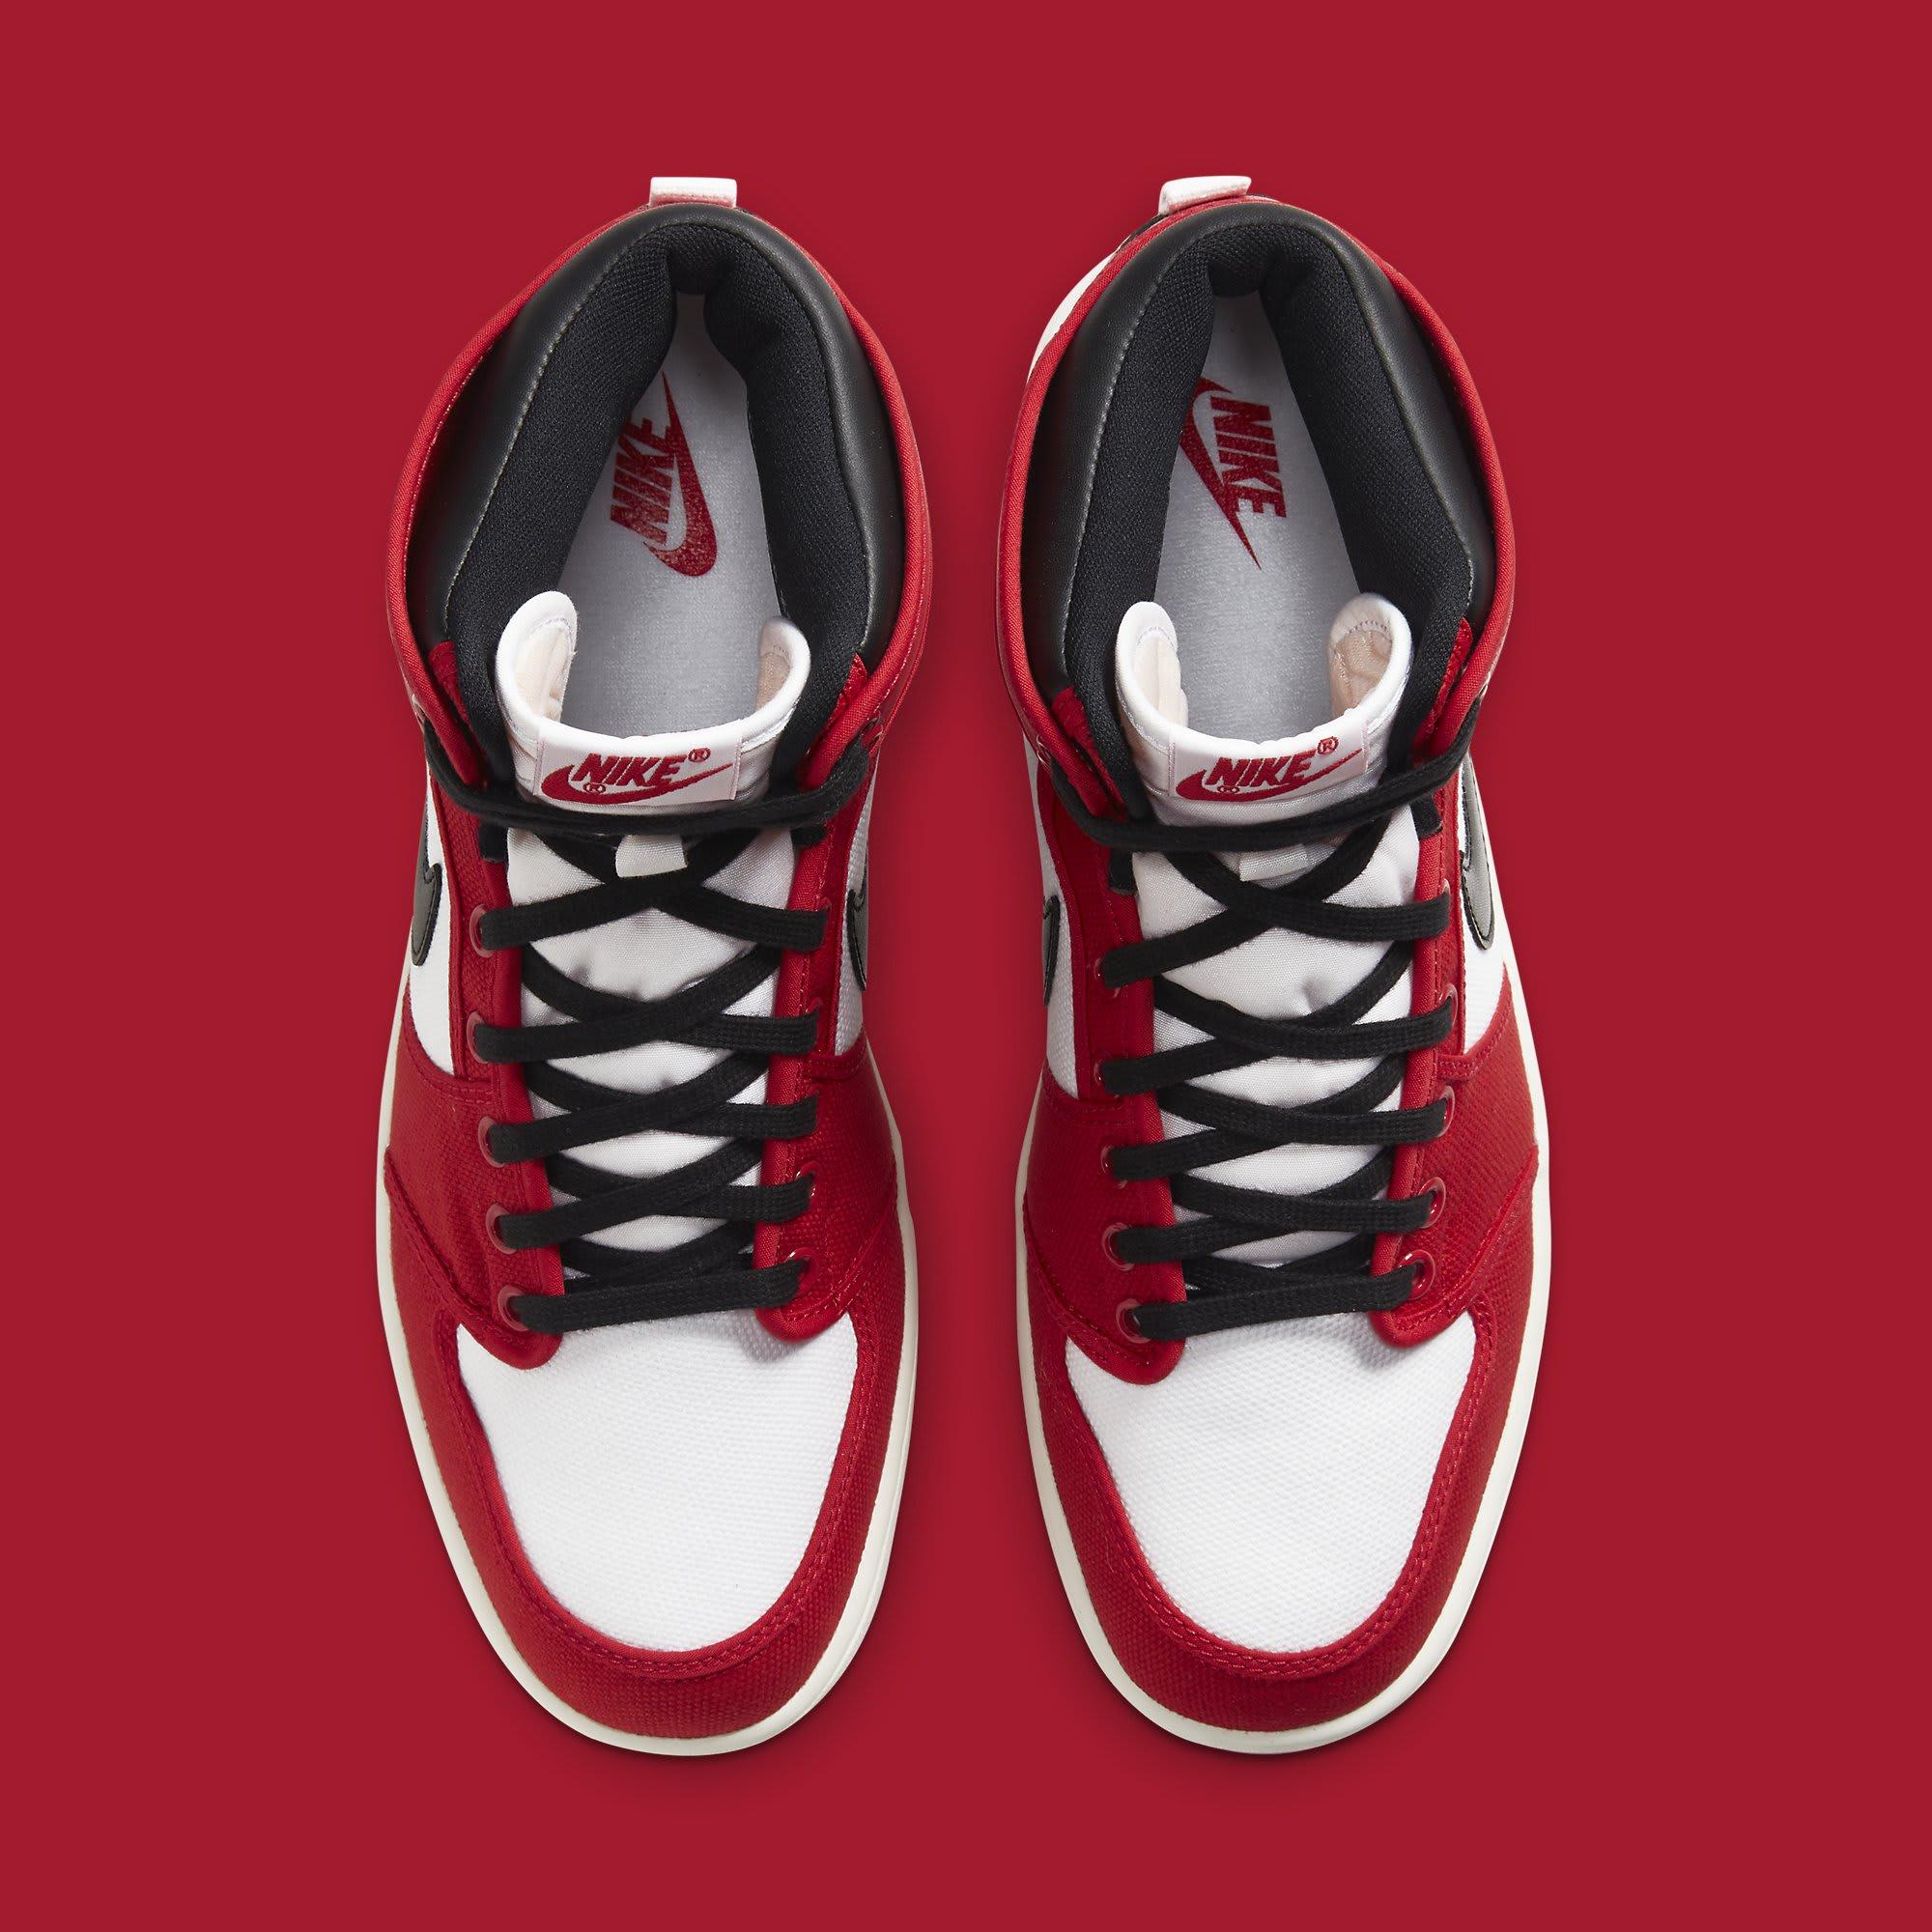 Air Jordan 1 KO Chicago 2021 Release Date DA9089-100 Top